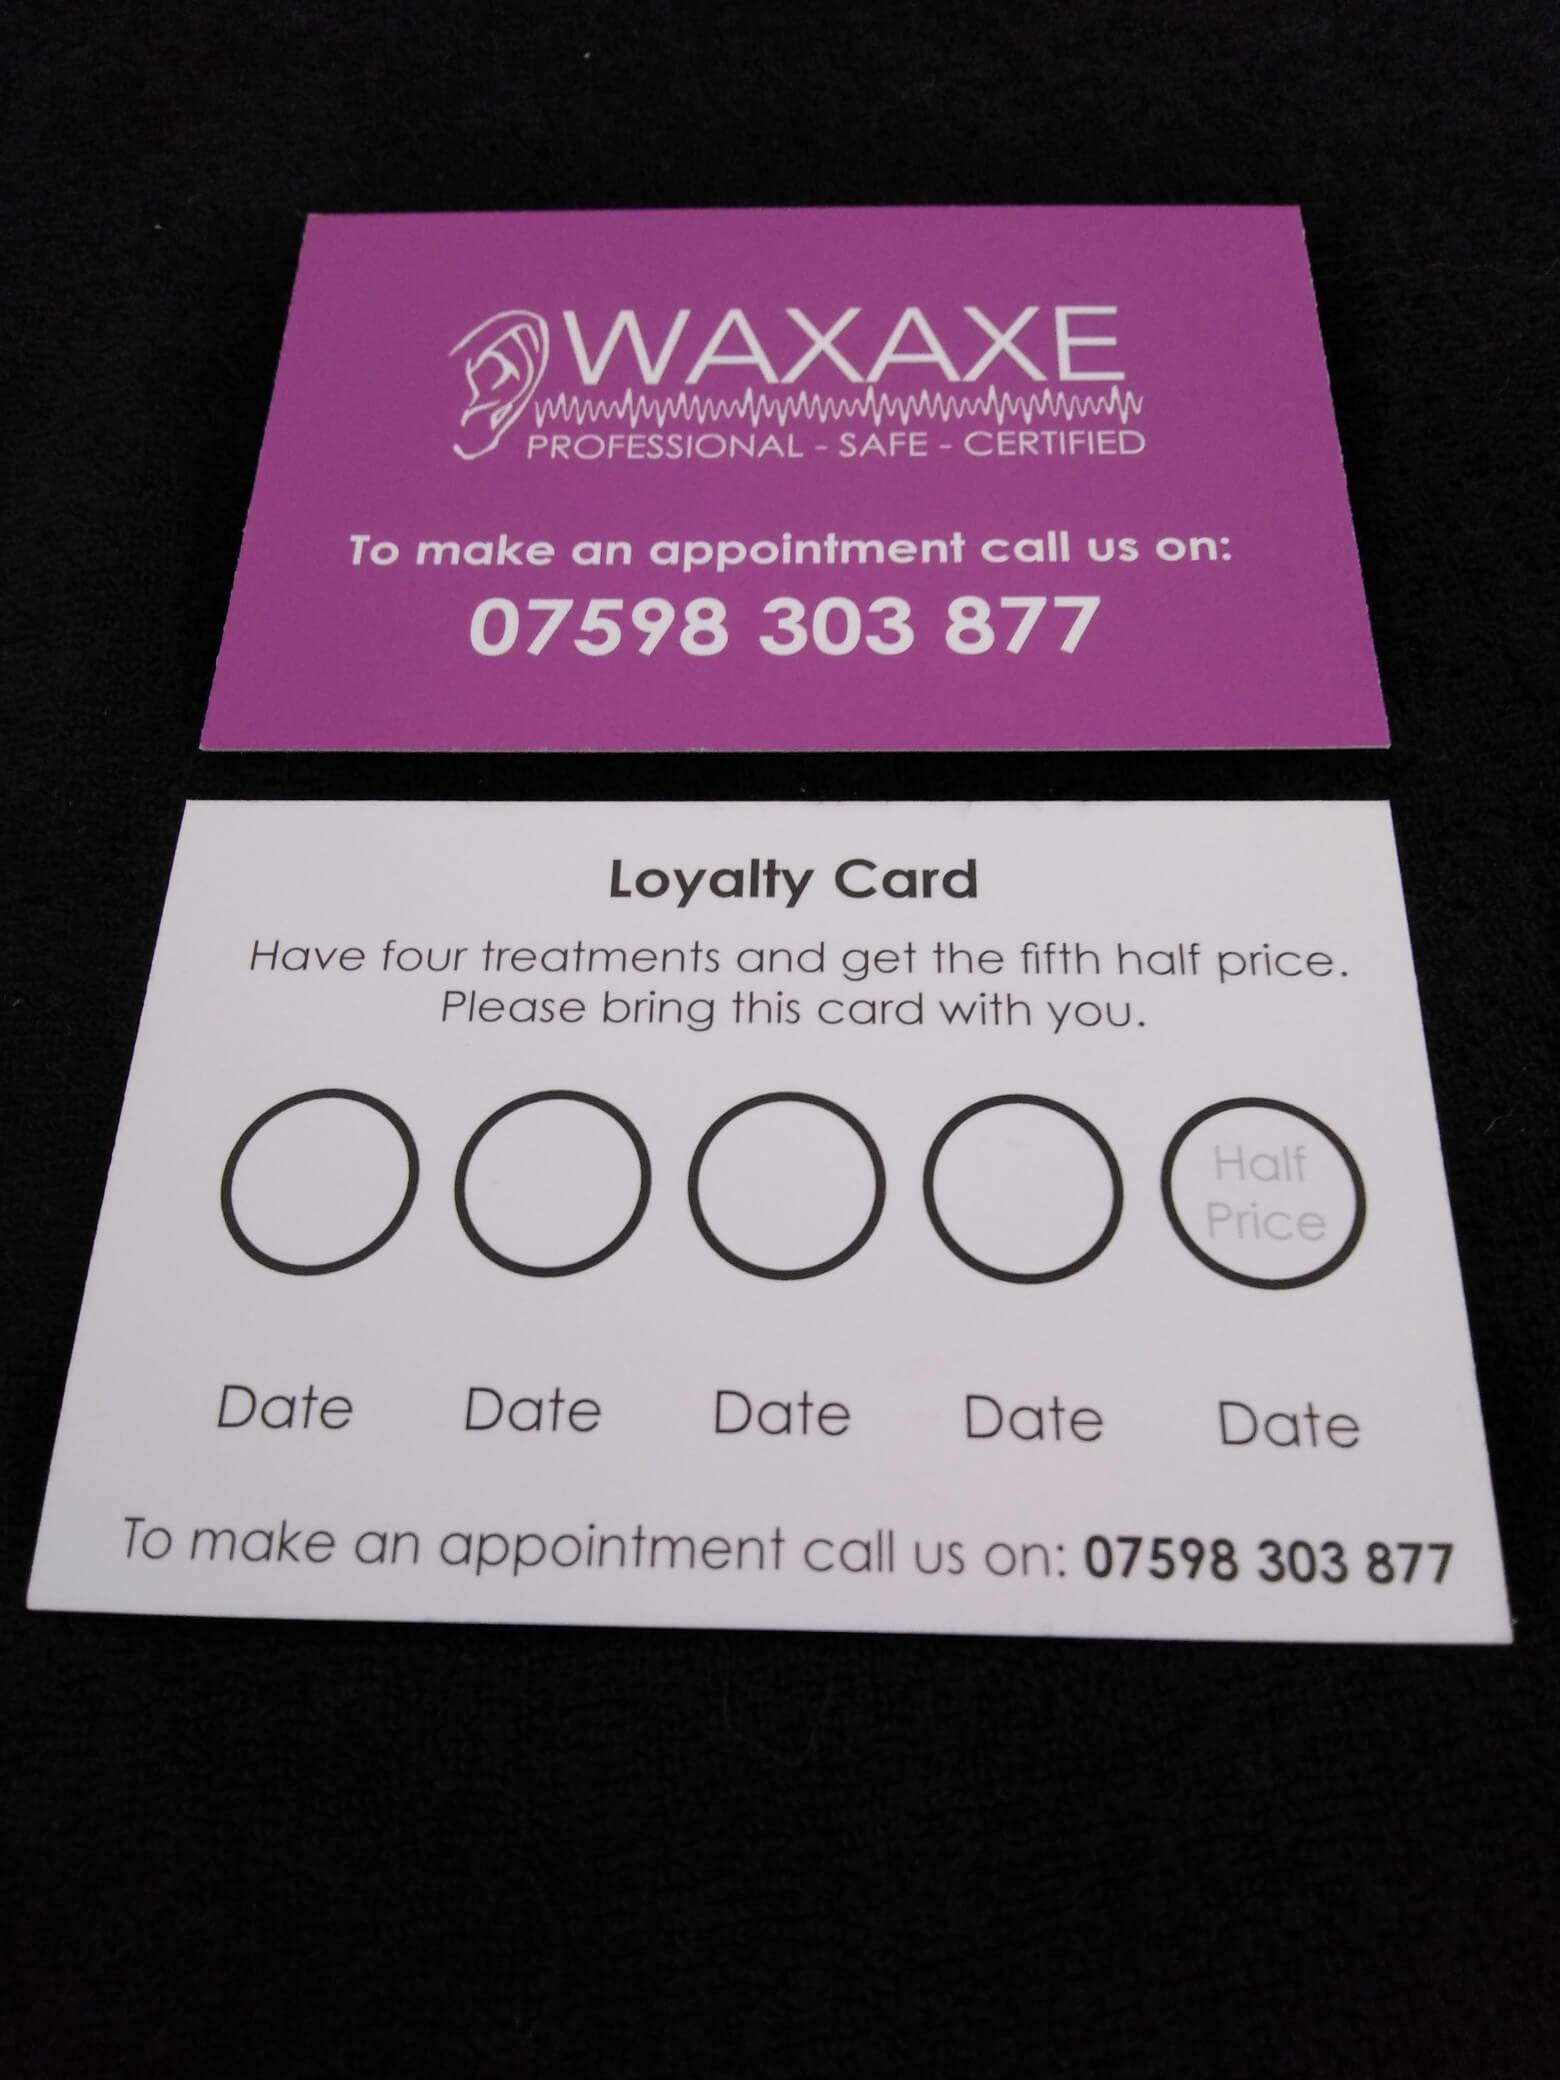 WaxAxe loyalty card